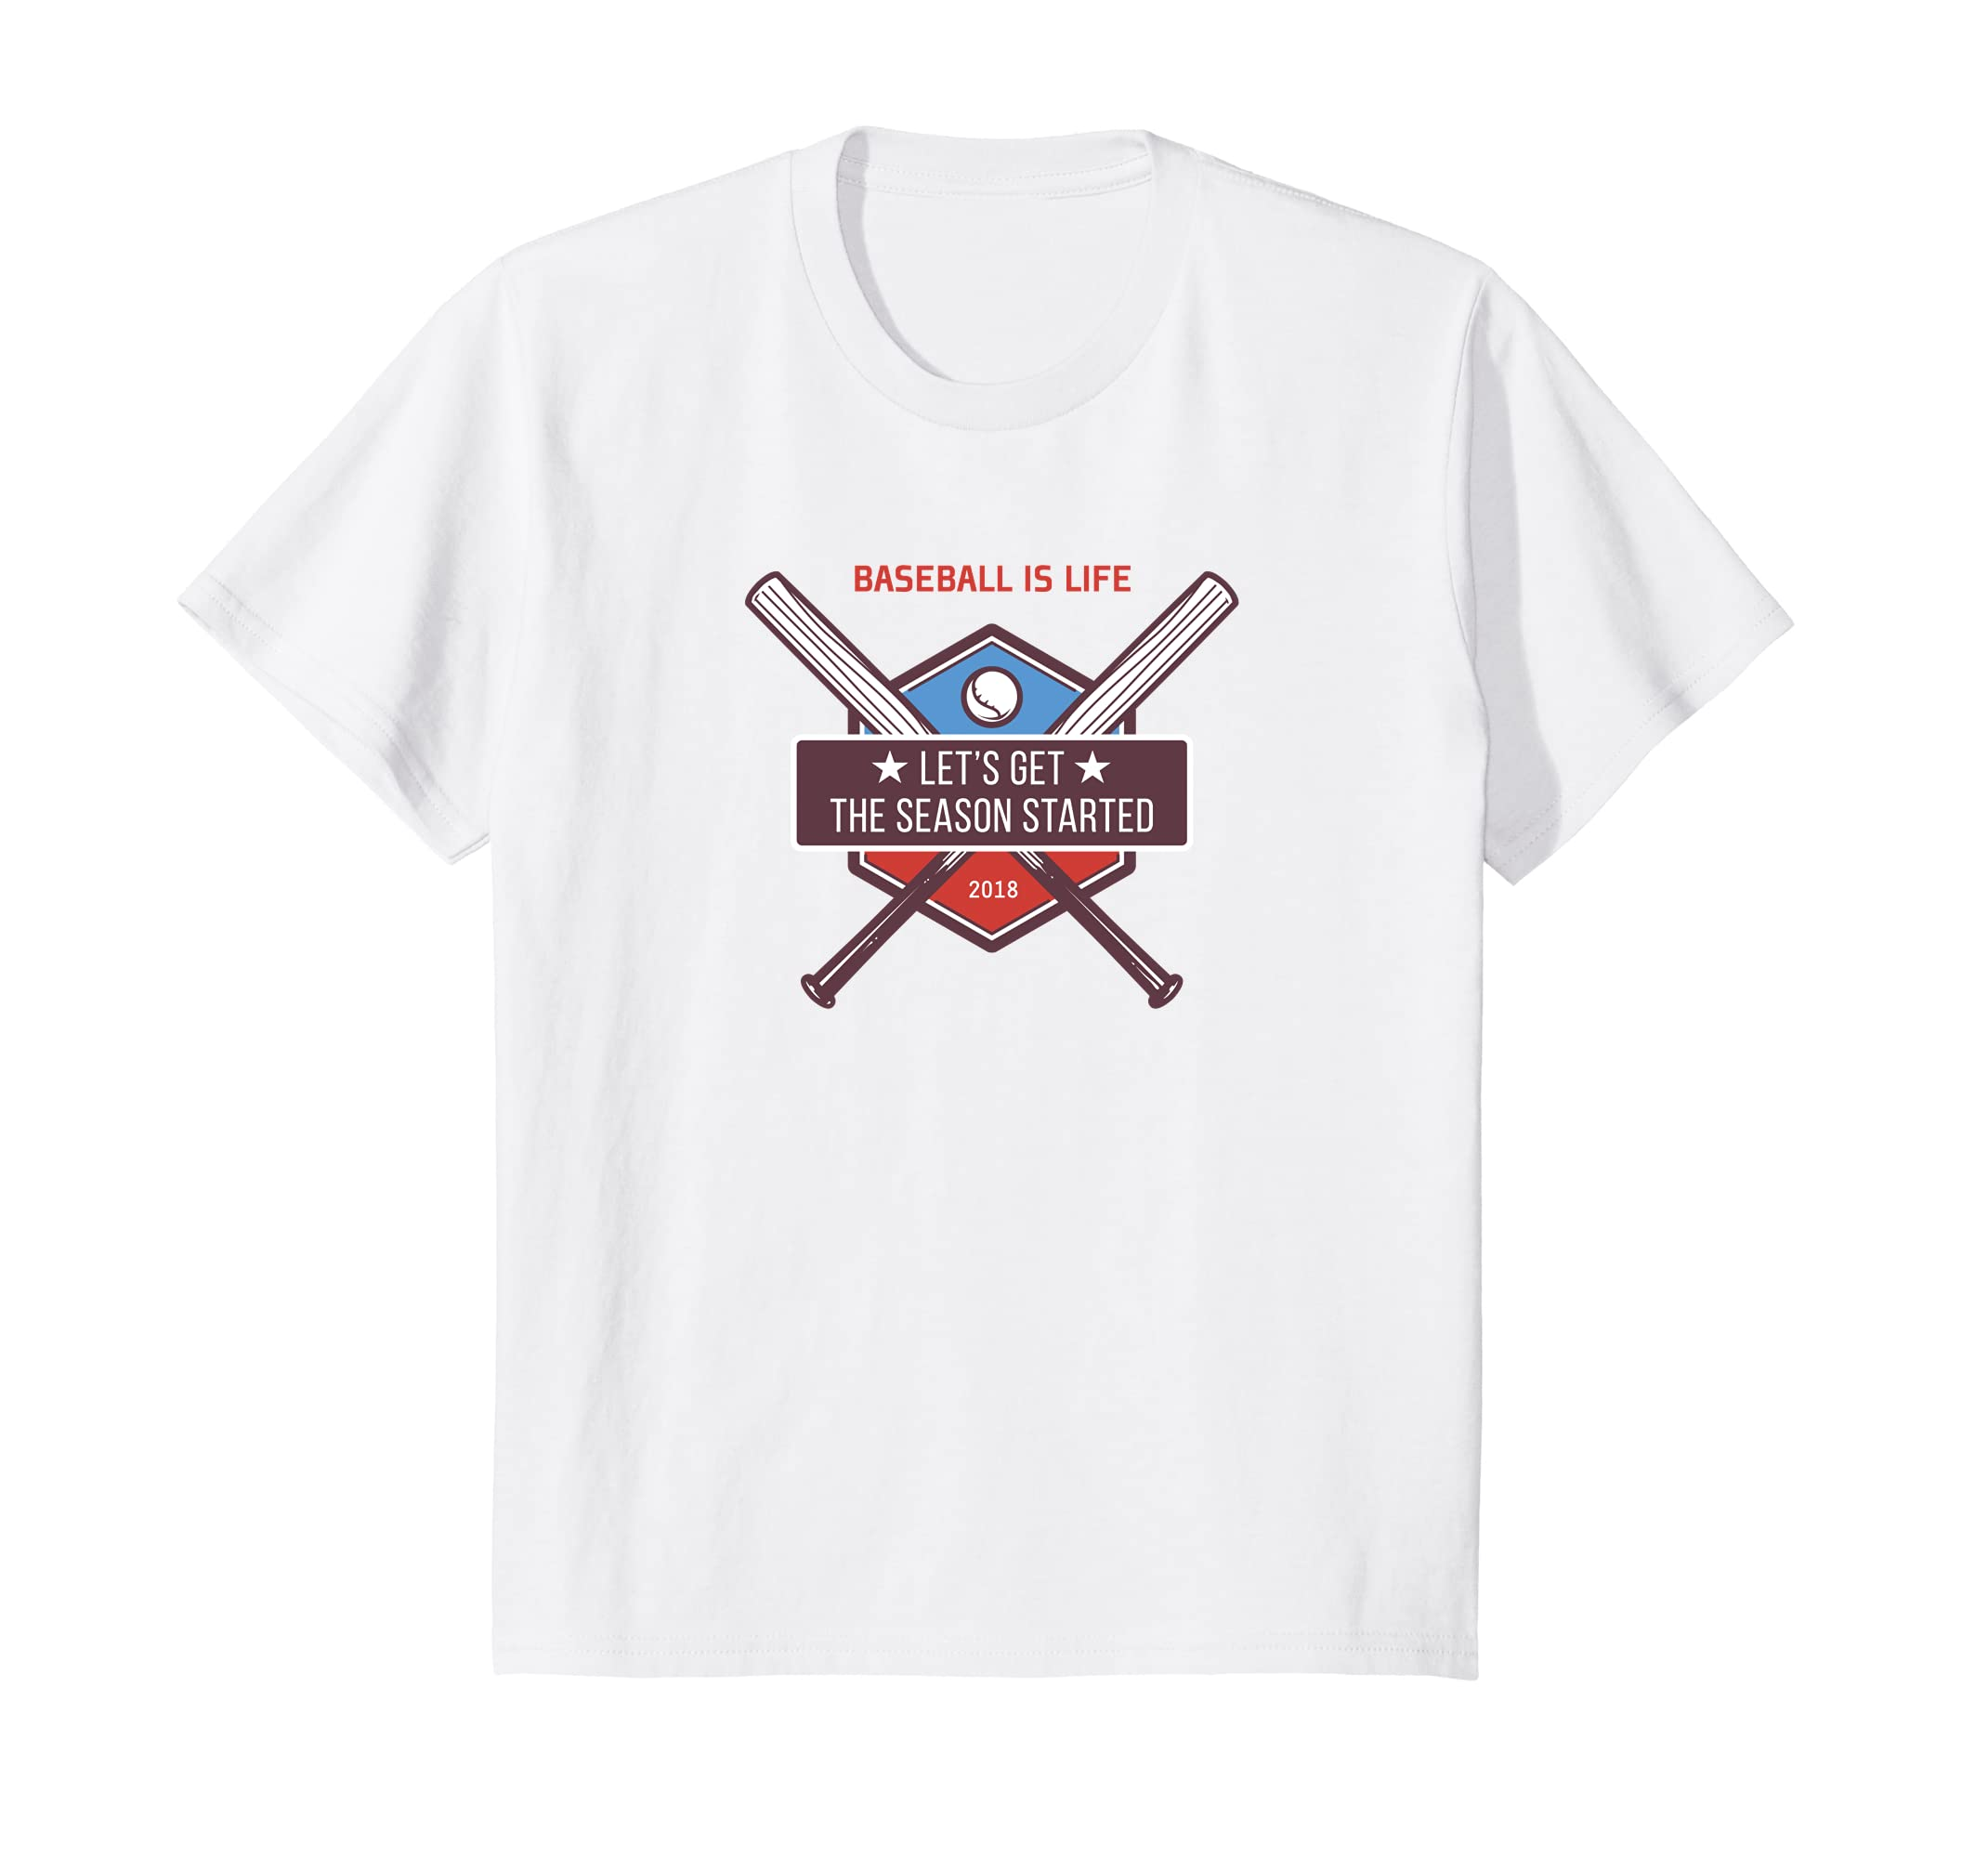 544e75f02 Amazon.com: Baseball 2018 T-shirt Spring Training Tee Ambassadors: Clothing